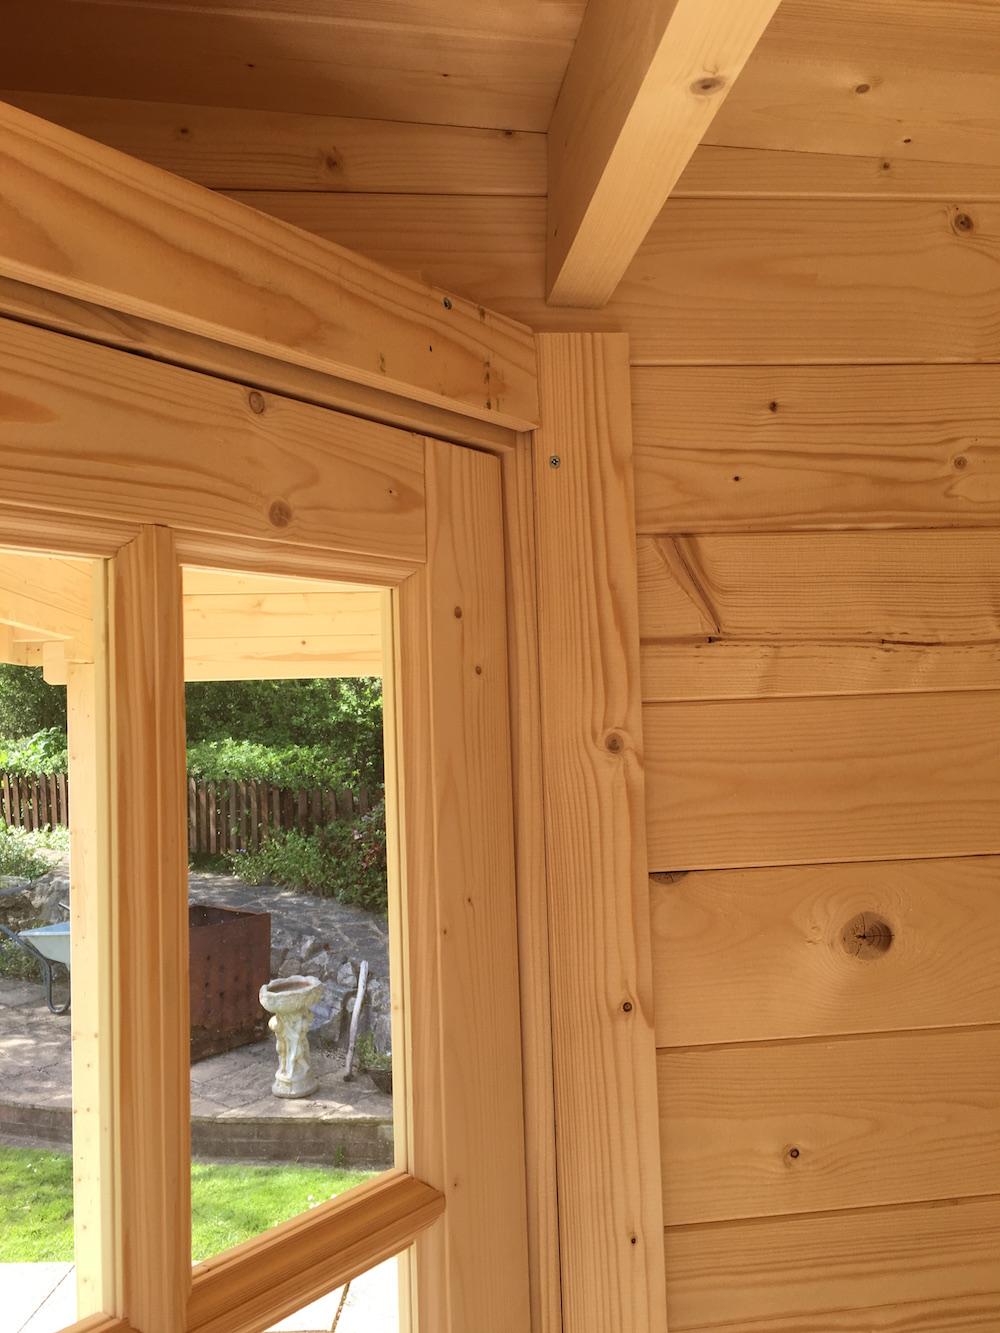 Inside the stig log cabin